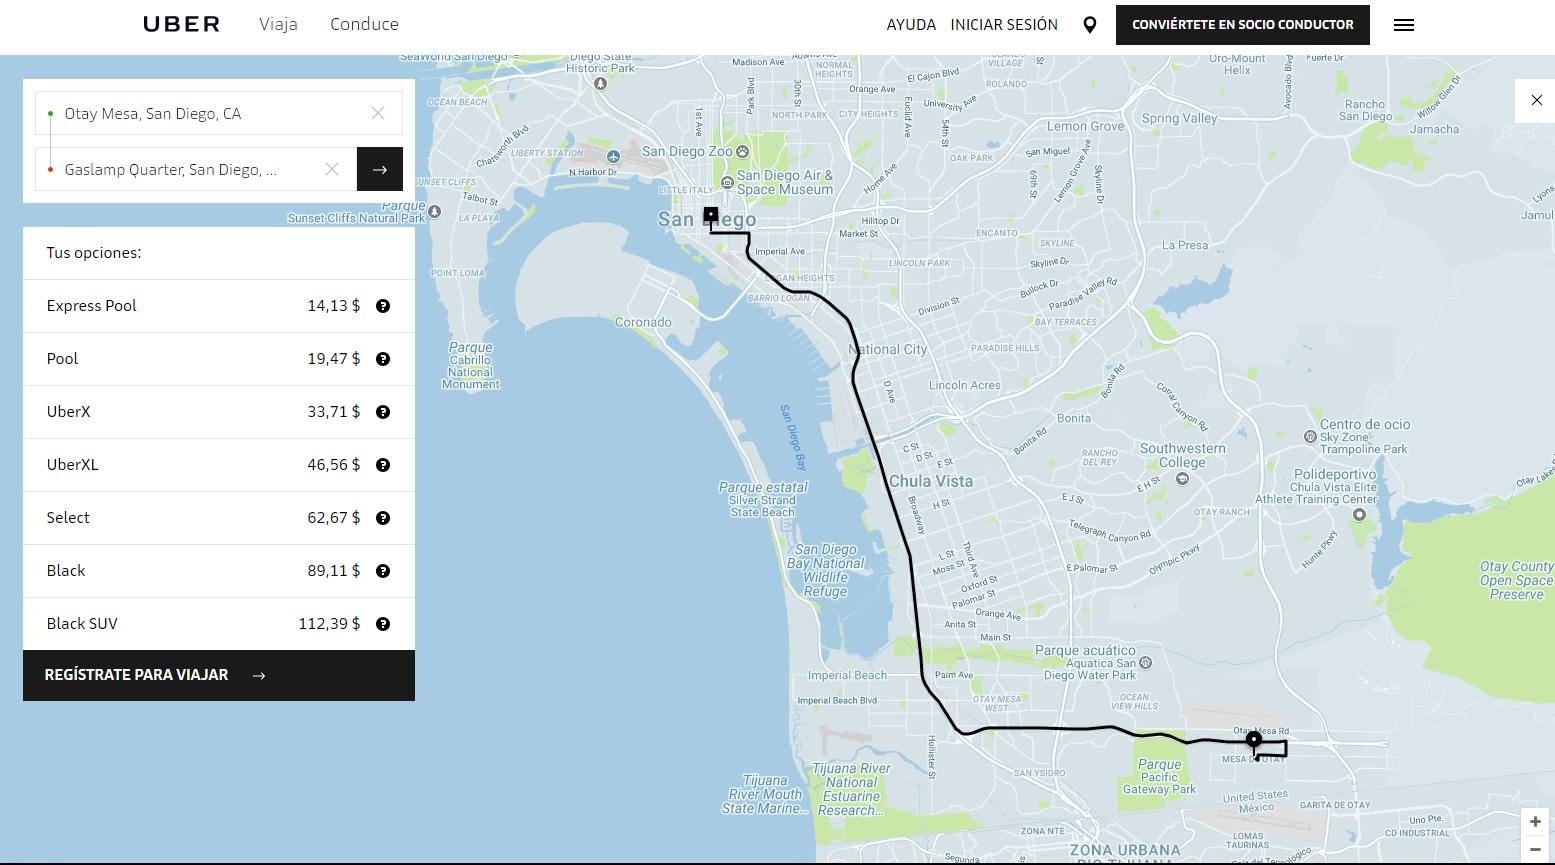 Cómo llegar a San Diego, California, desde Tijuana_uber